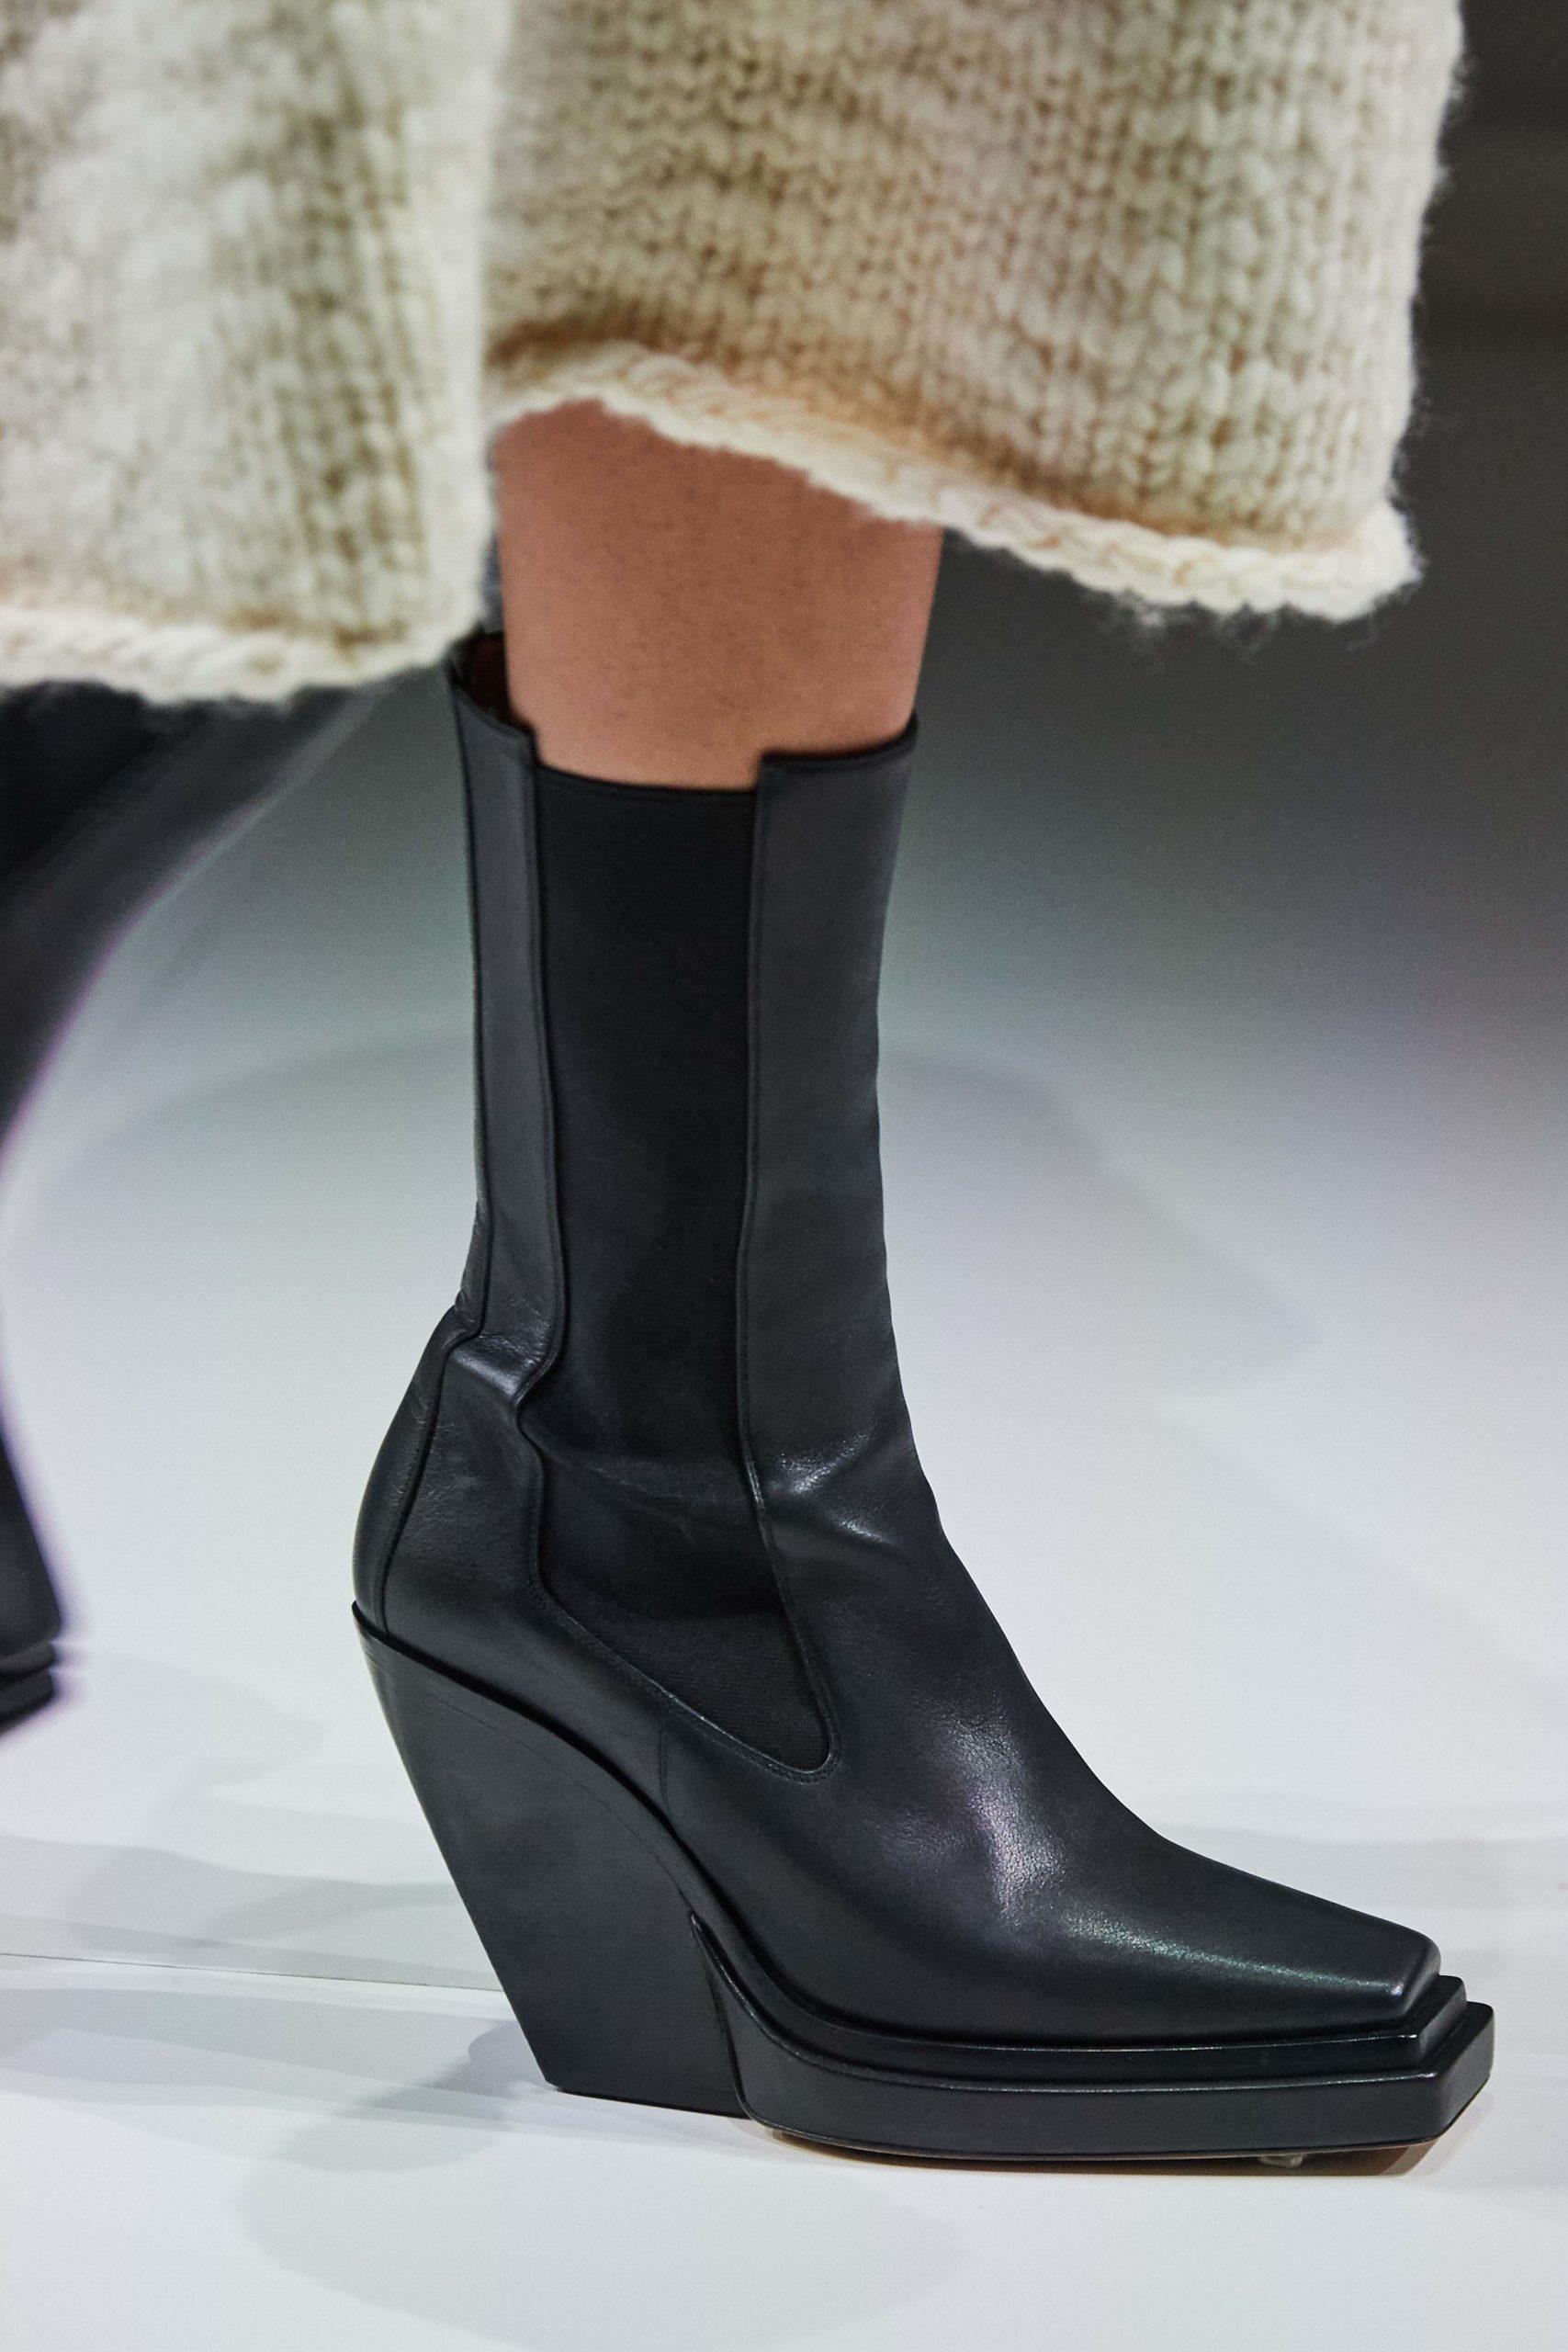 Bottega Veneta Fall 2020 trends runway report Ready To Wear Vogue details boots